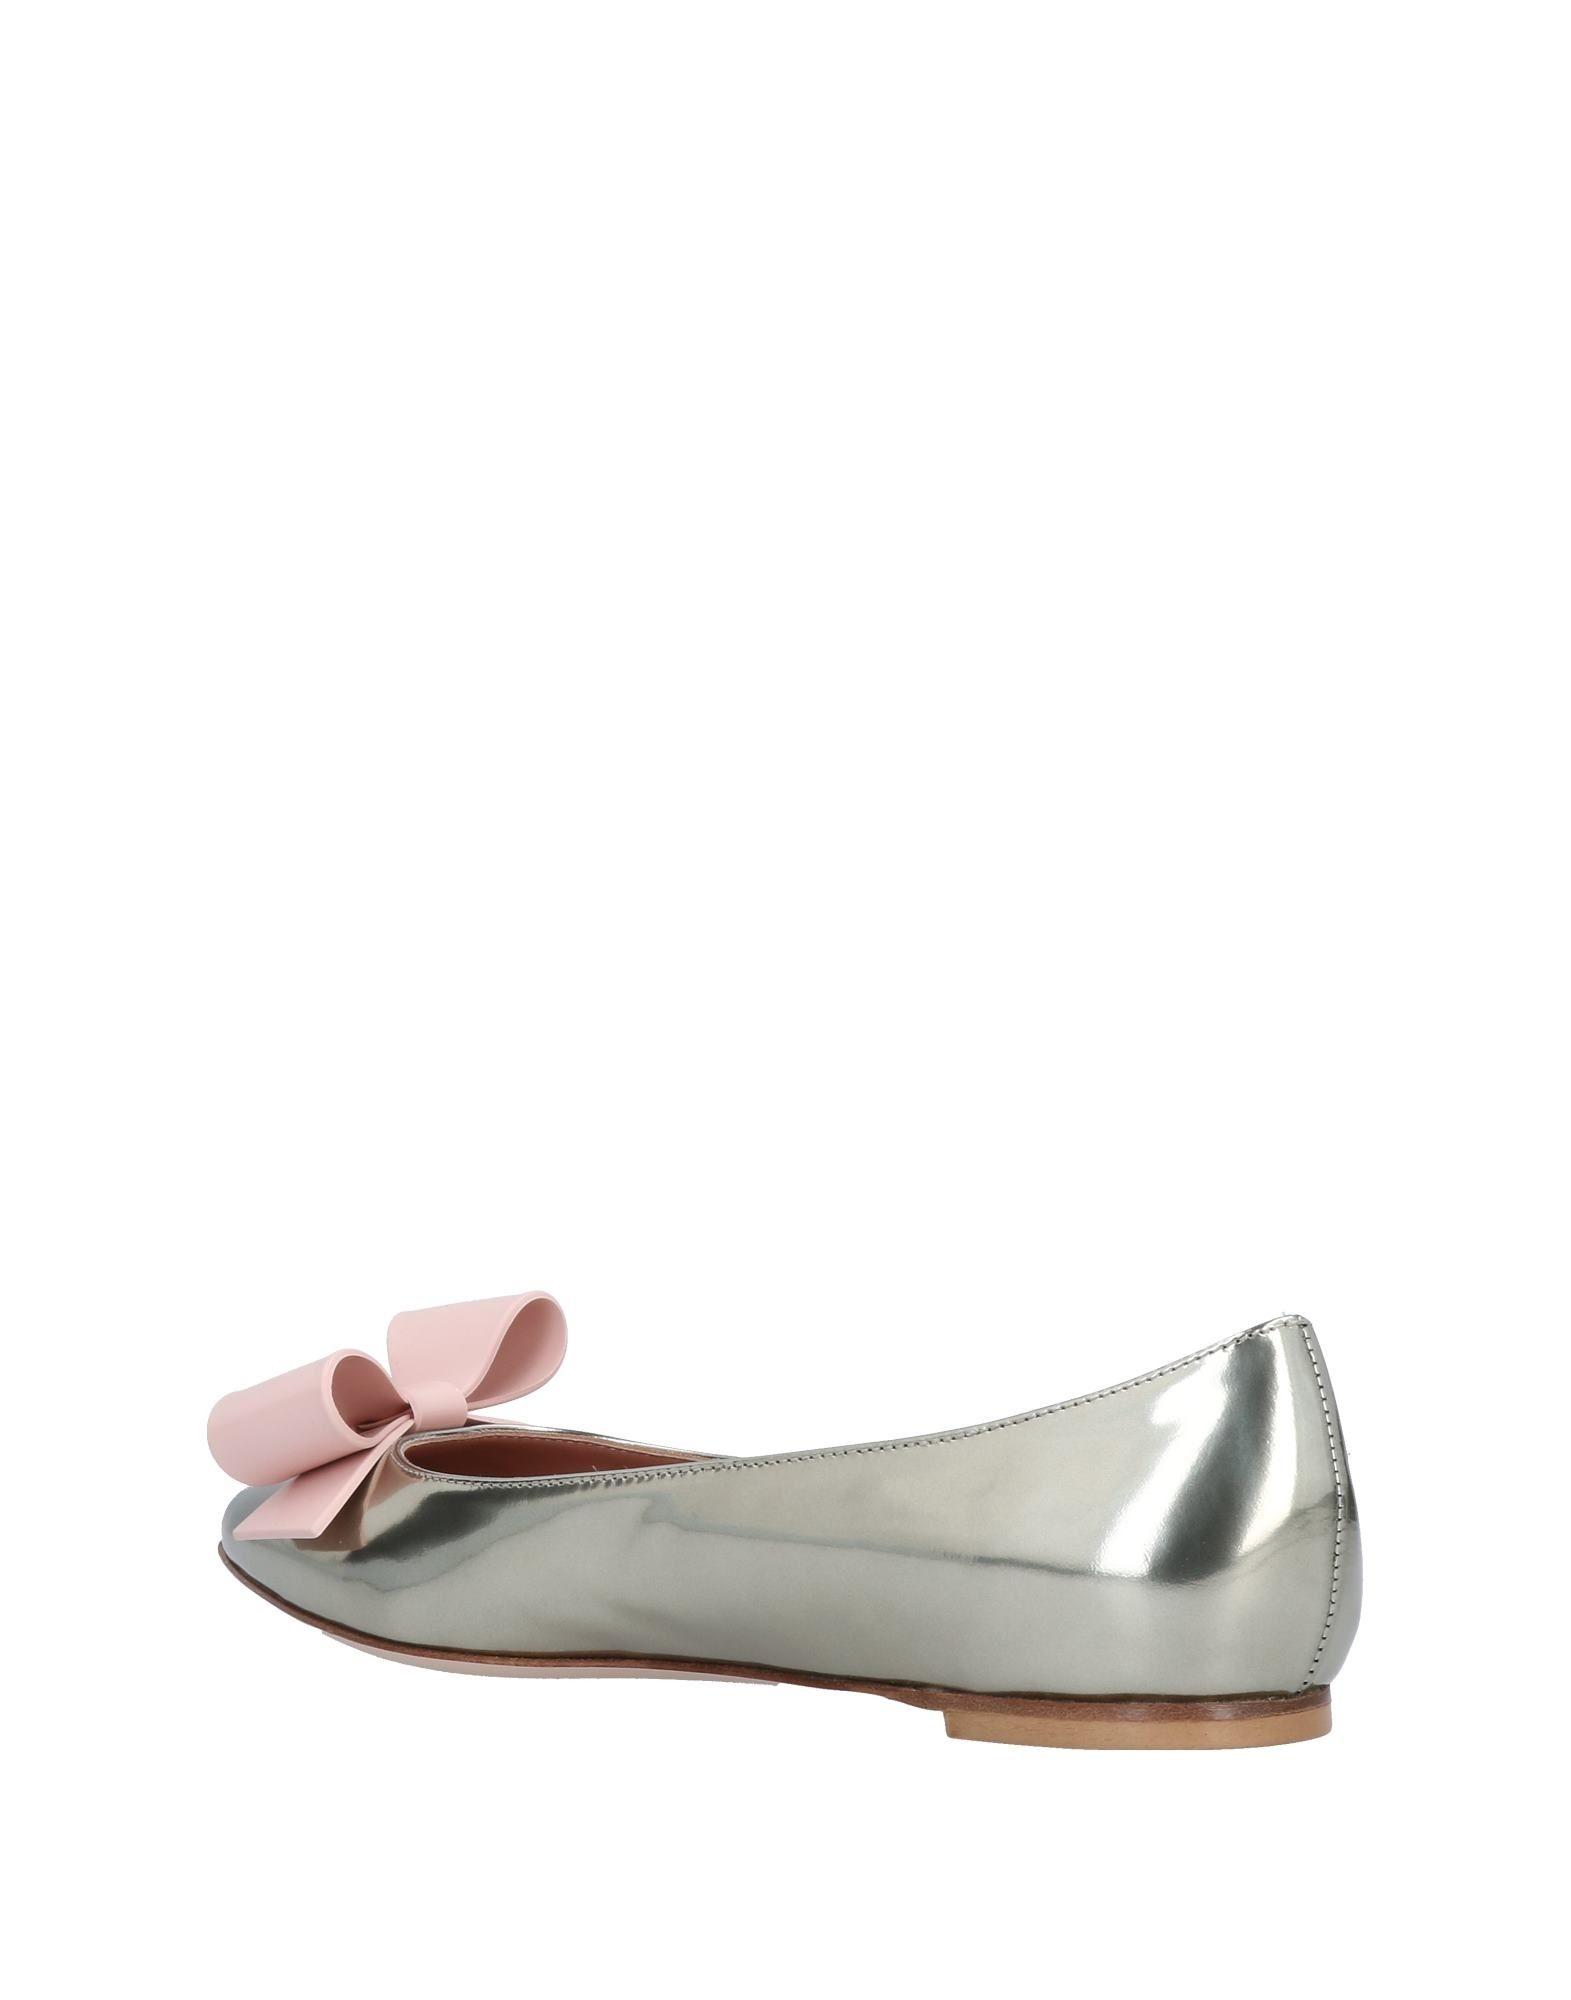 Stilvolle billige Schuhe Red(V) Ballerinas Damen Damen Damen  11494500GX bdcafb